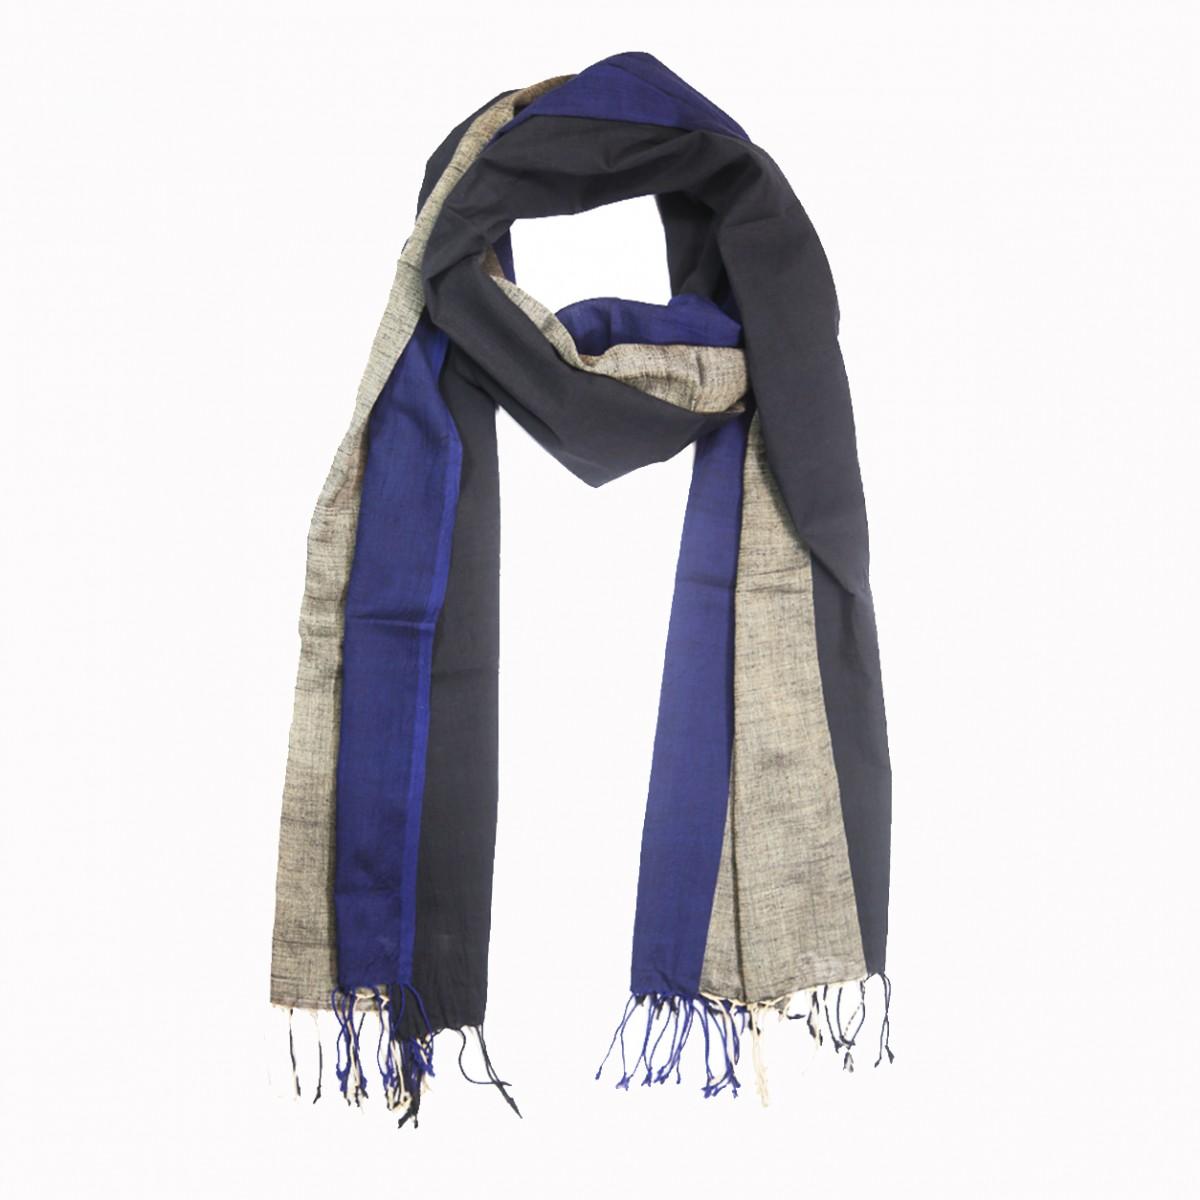 Handloom woven panels cotton scarf